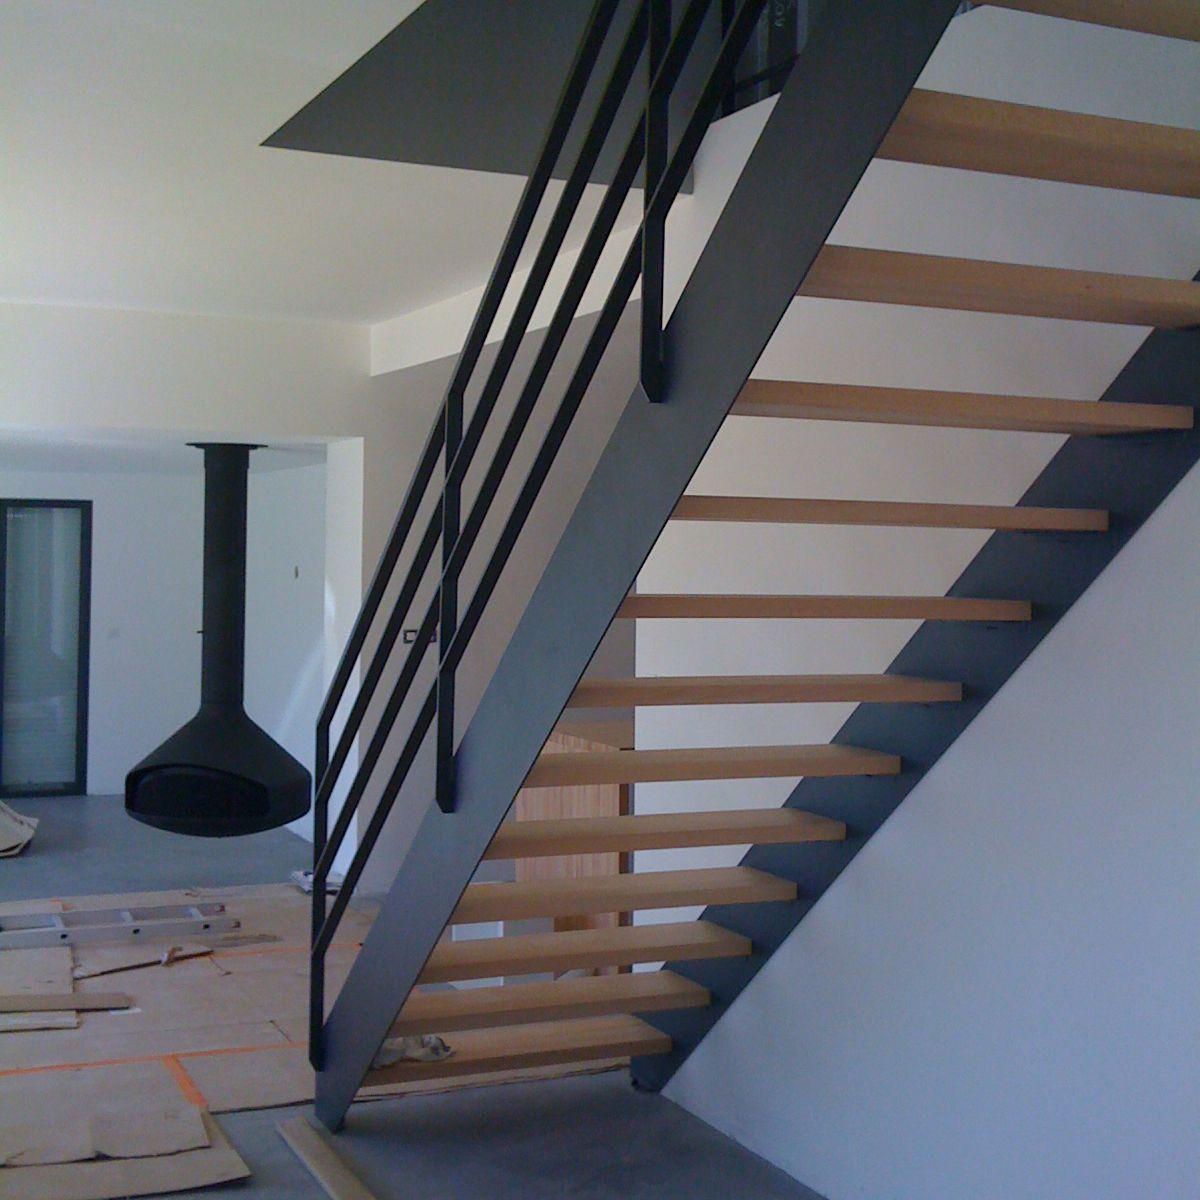 Escalier Bois Metal Noir straight staircase / quarter-turn / metal frame / wooden